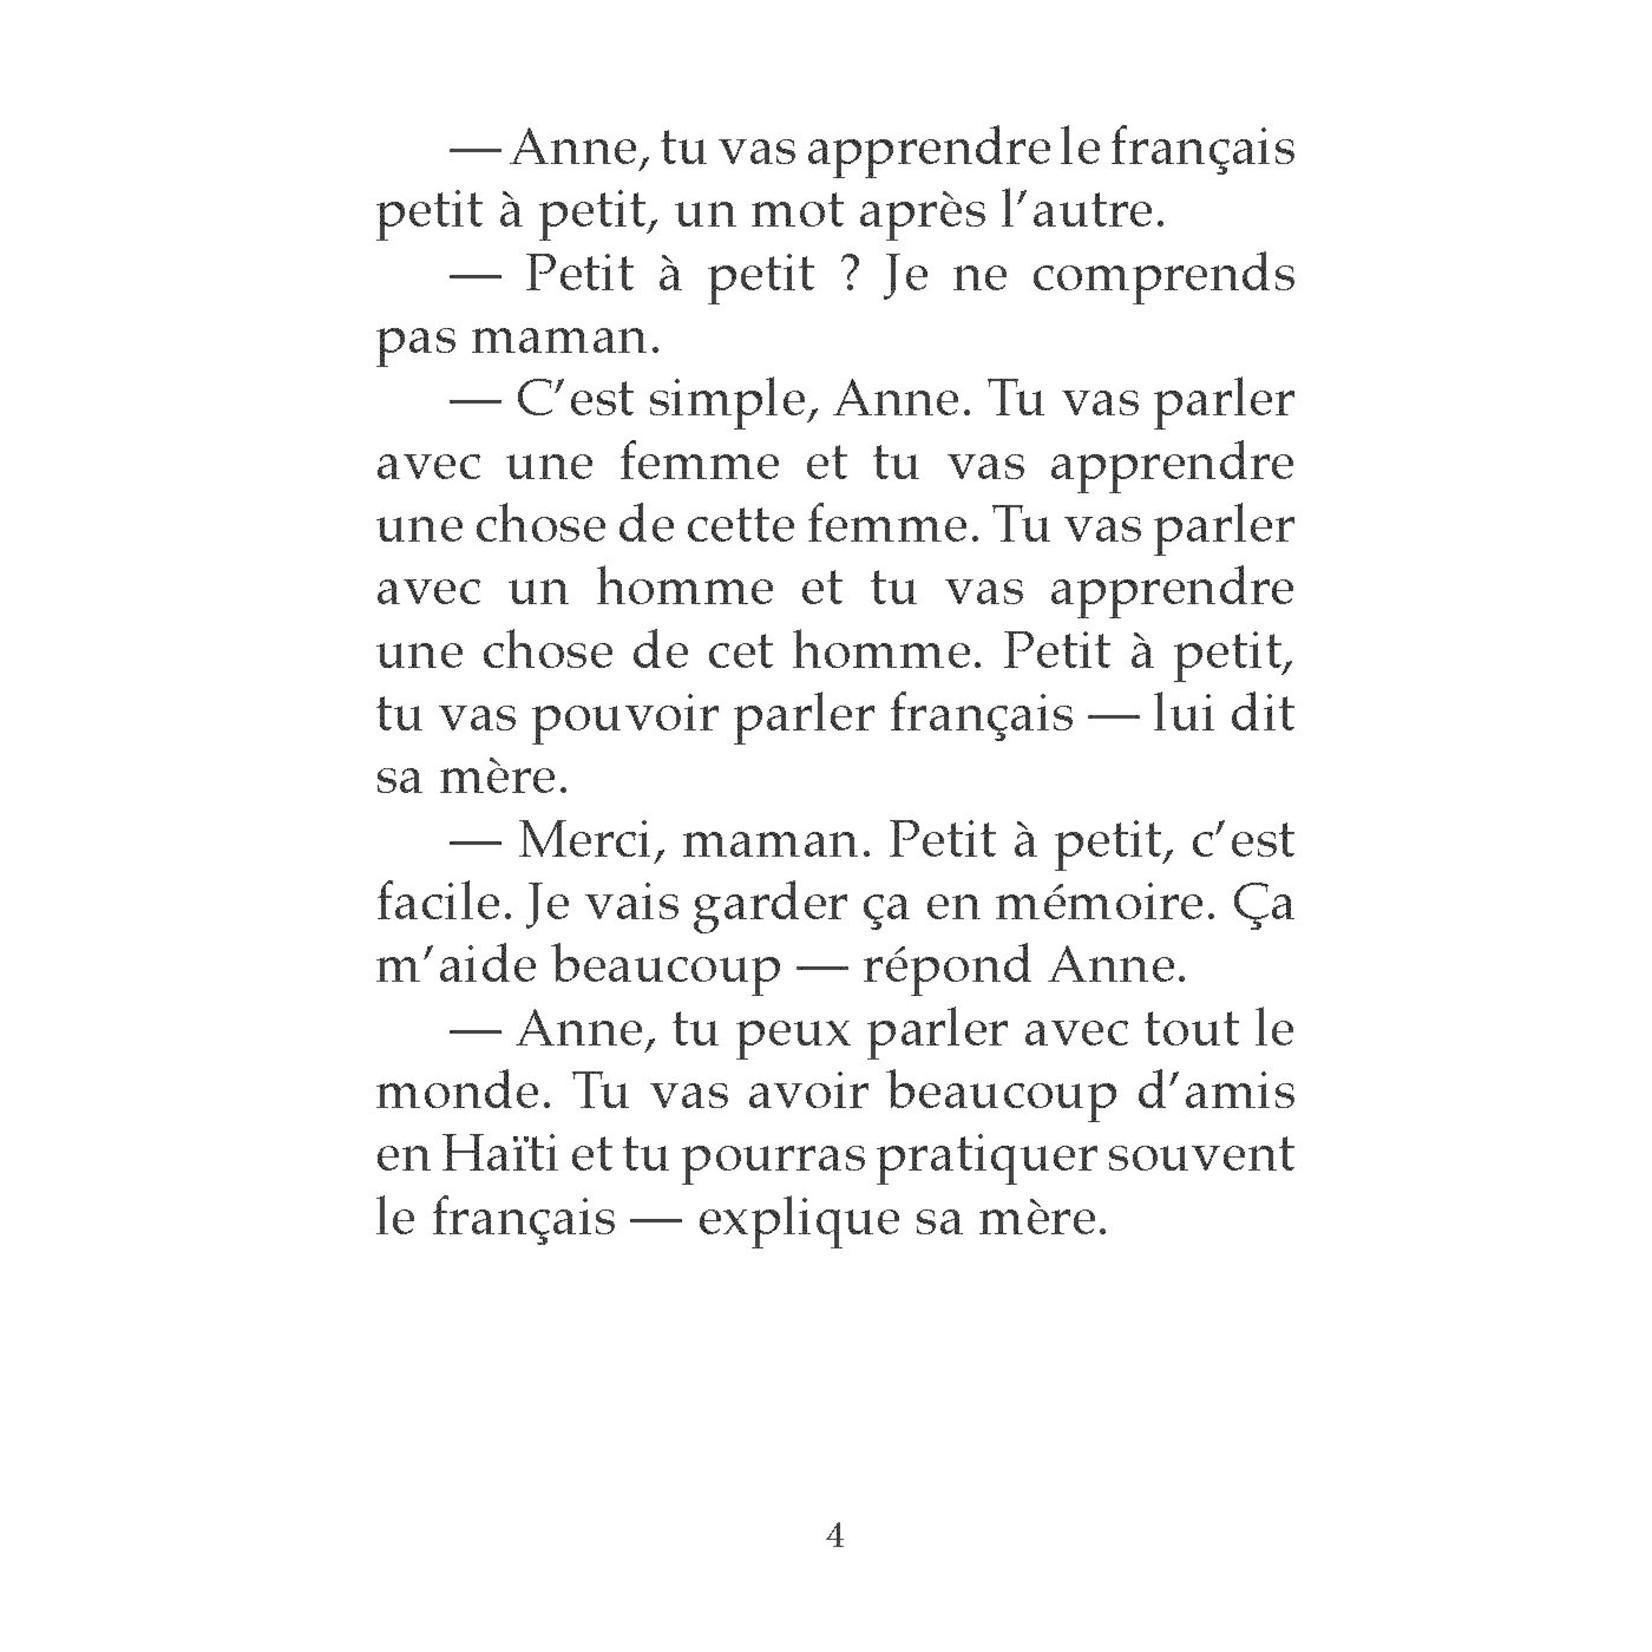 TPRS Books Pauvre Petite Anne